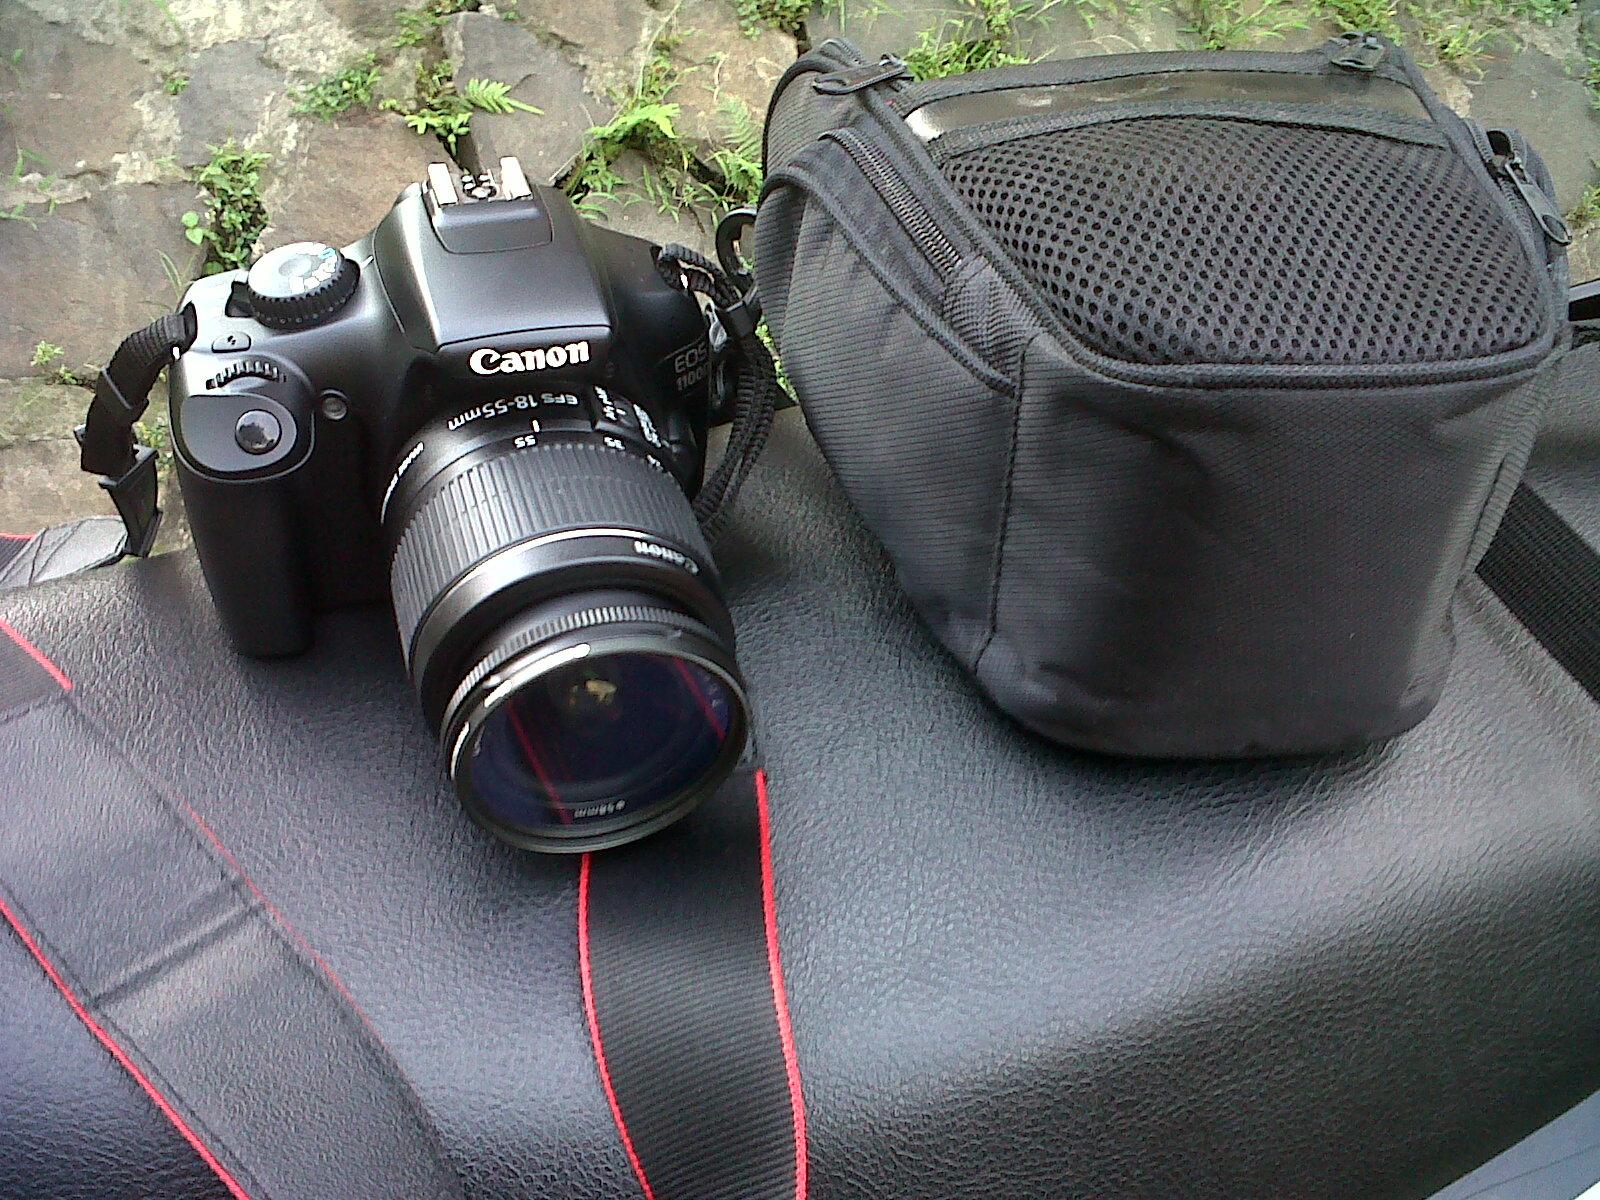 Jual Kamera Dslr Canon Eos 1100d